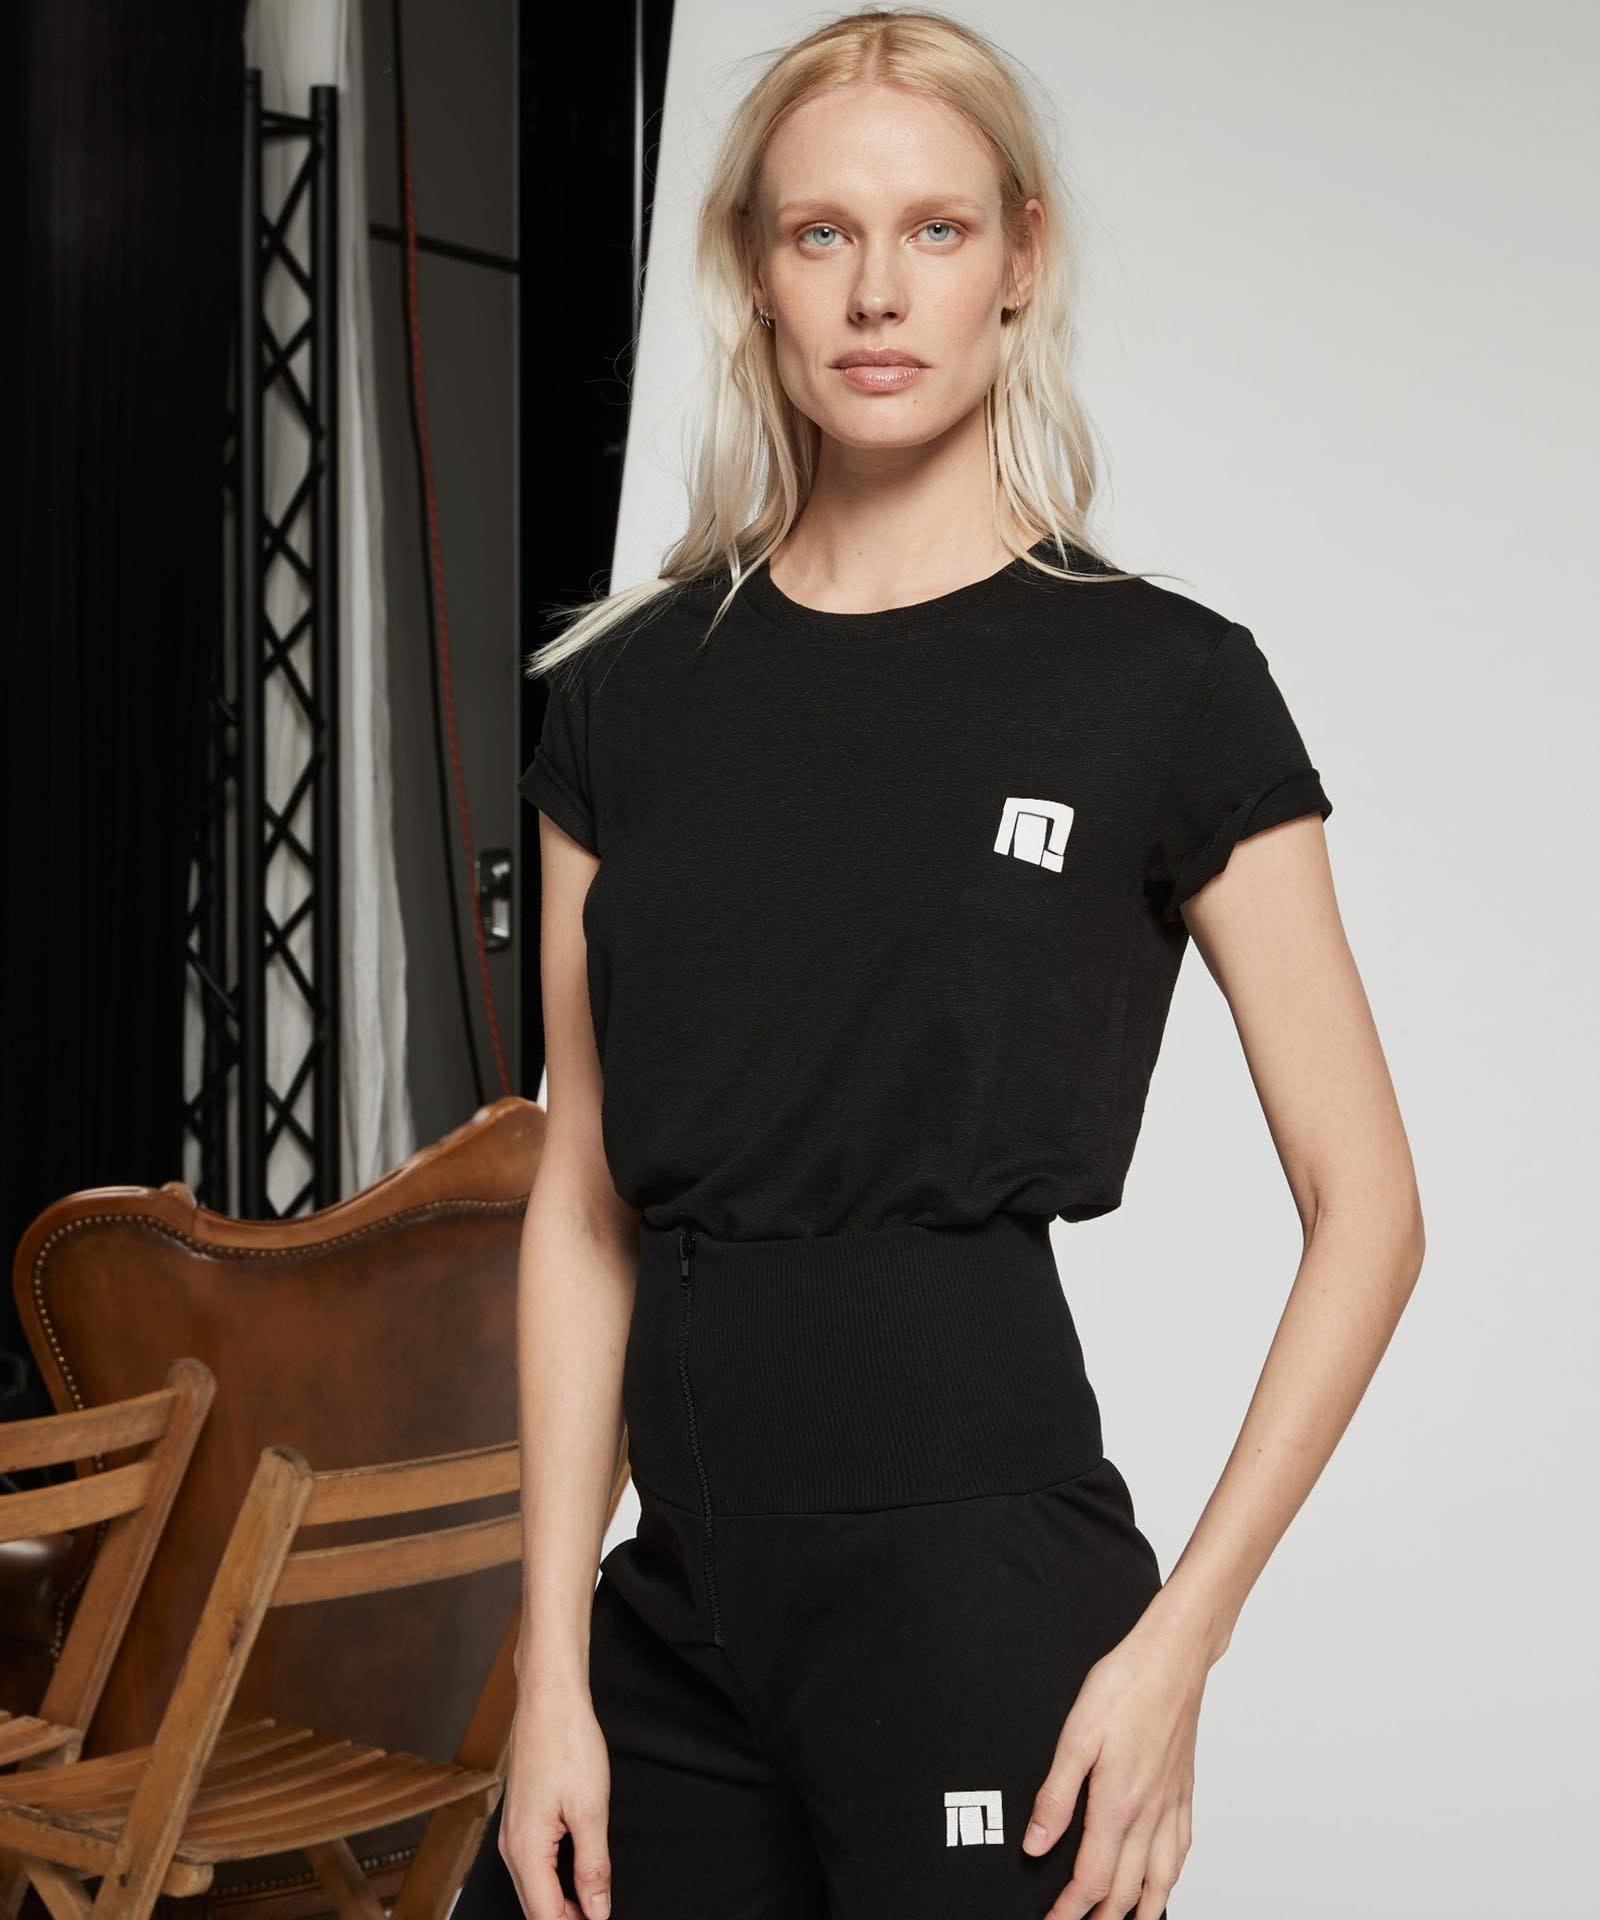 T-shirt No3 Linen Tee black Emilly Marant-2